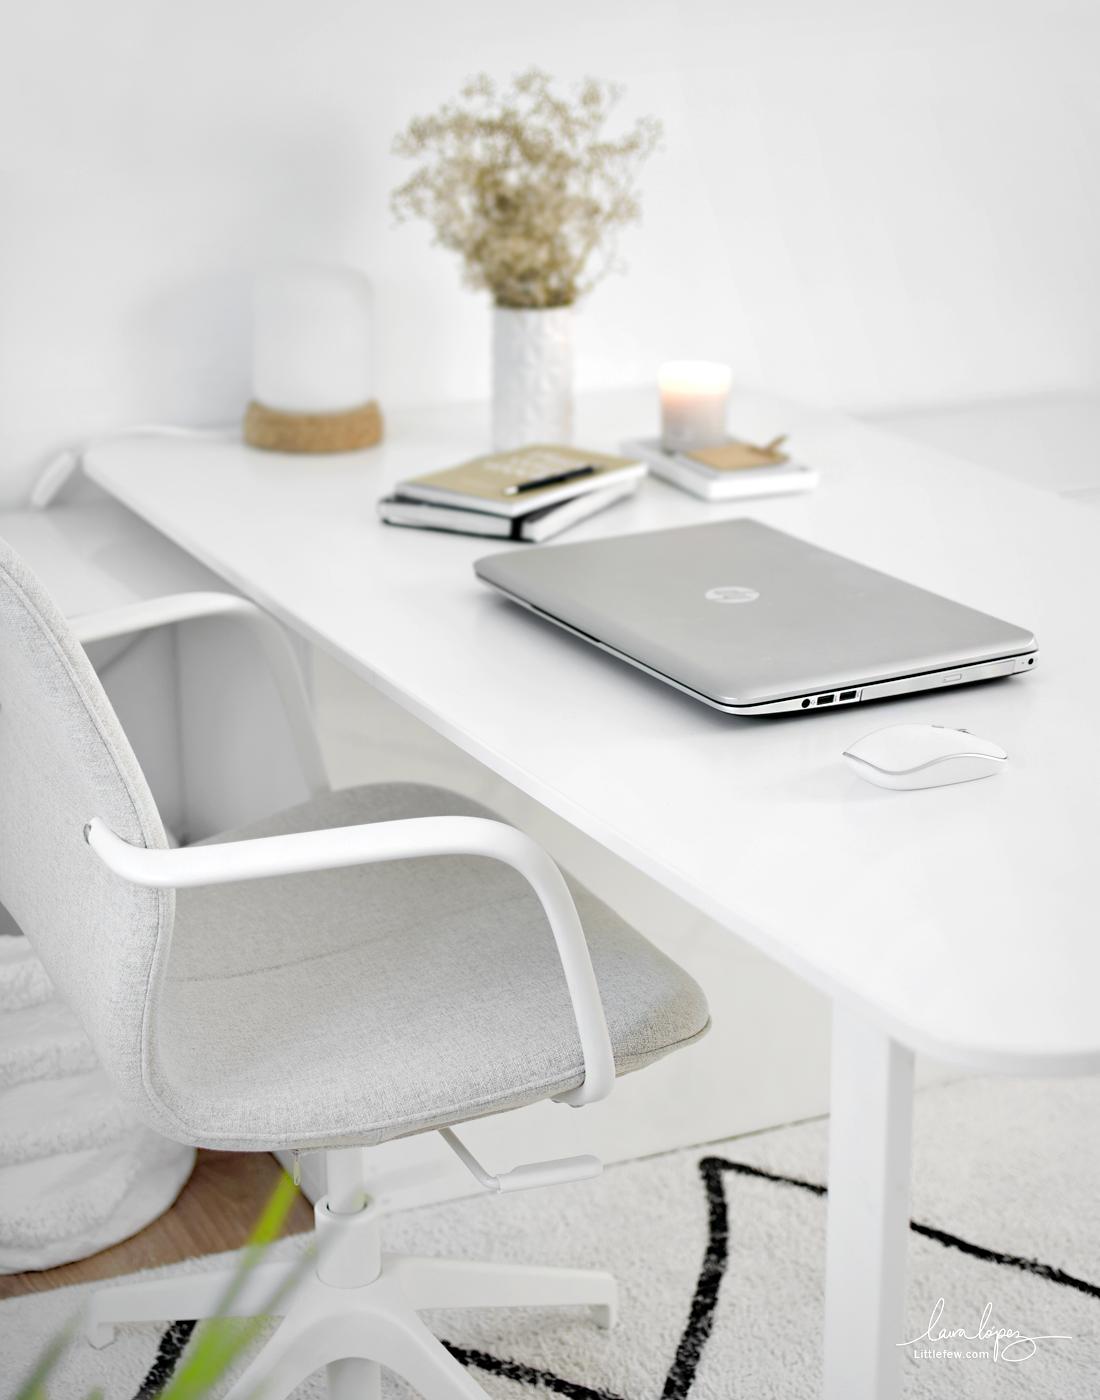 WORK AT HOME WITH STYLE: NEW IKEA WHITE CHAIR  /  Trabaja en casa con estilo: nueva silla de oficina blanca (IKEA)